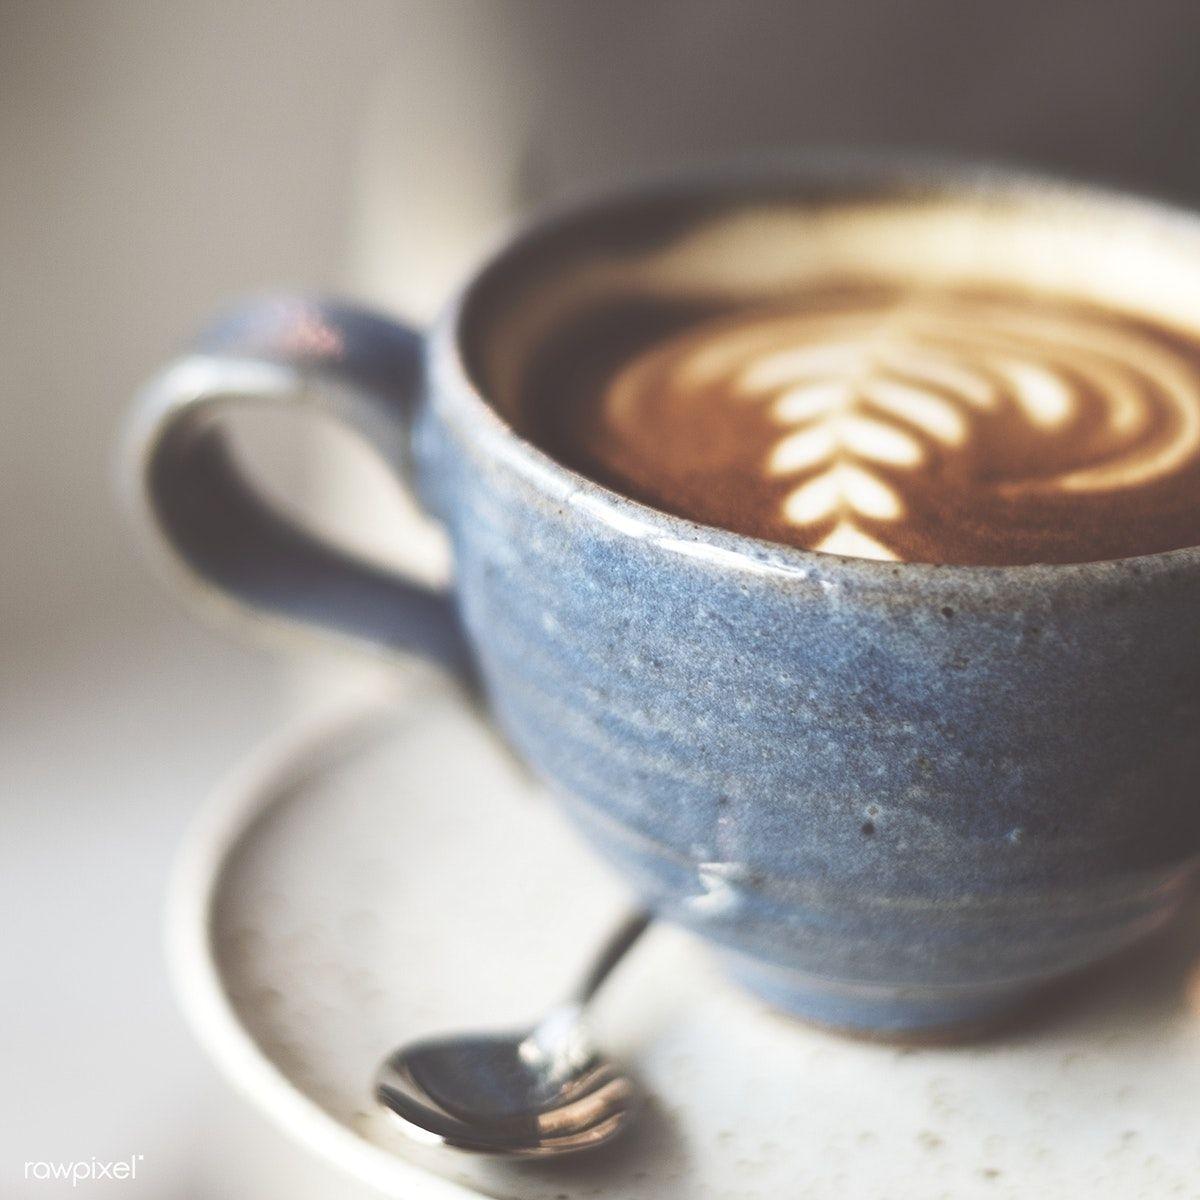 Closeup of hot coffee free image by (มีรูป